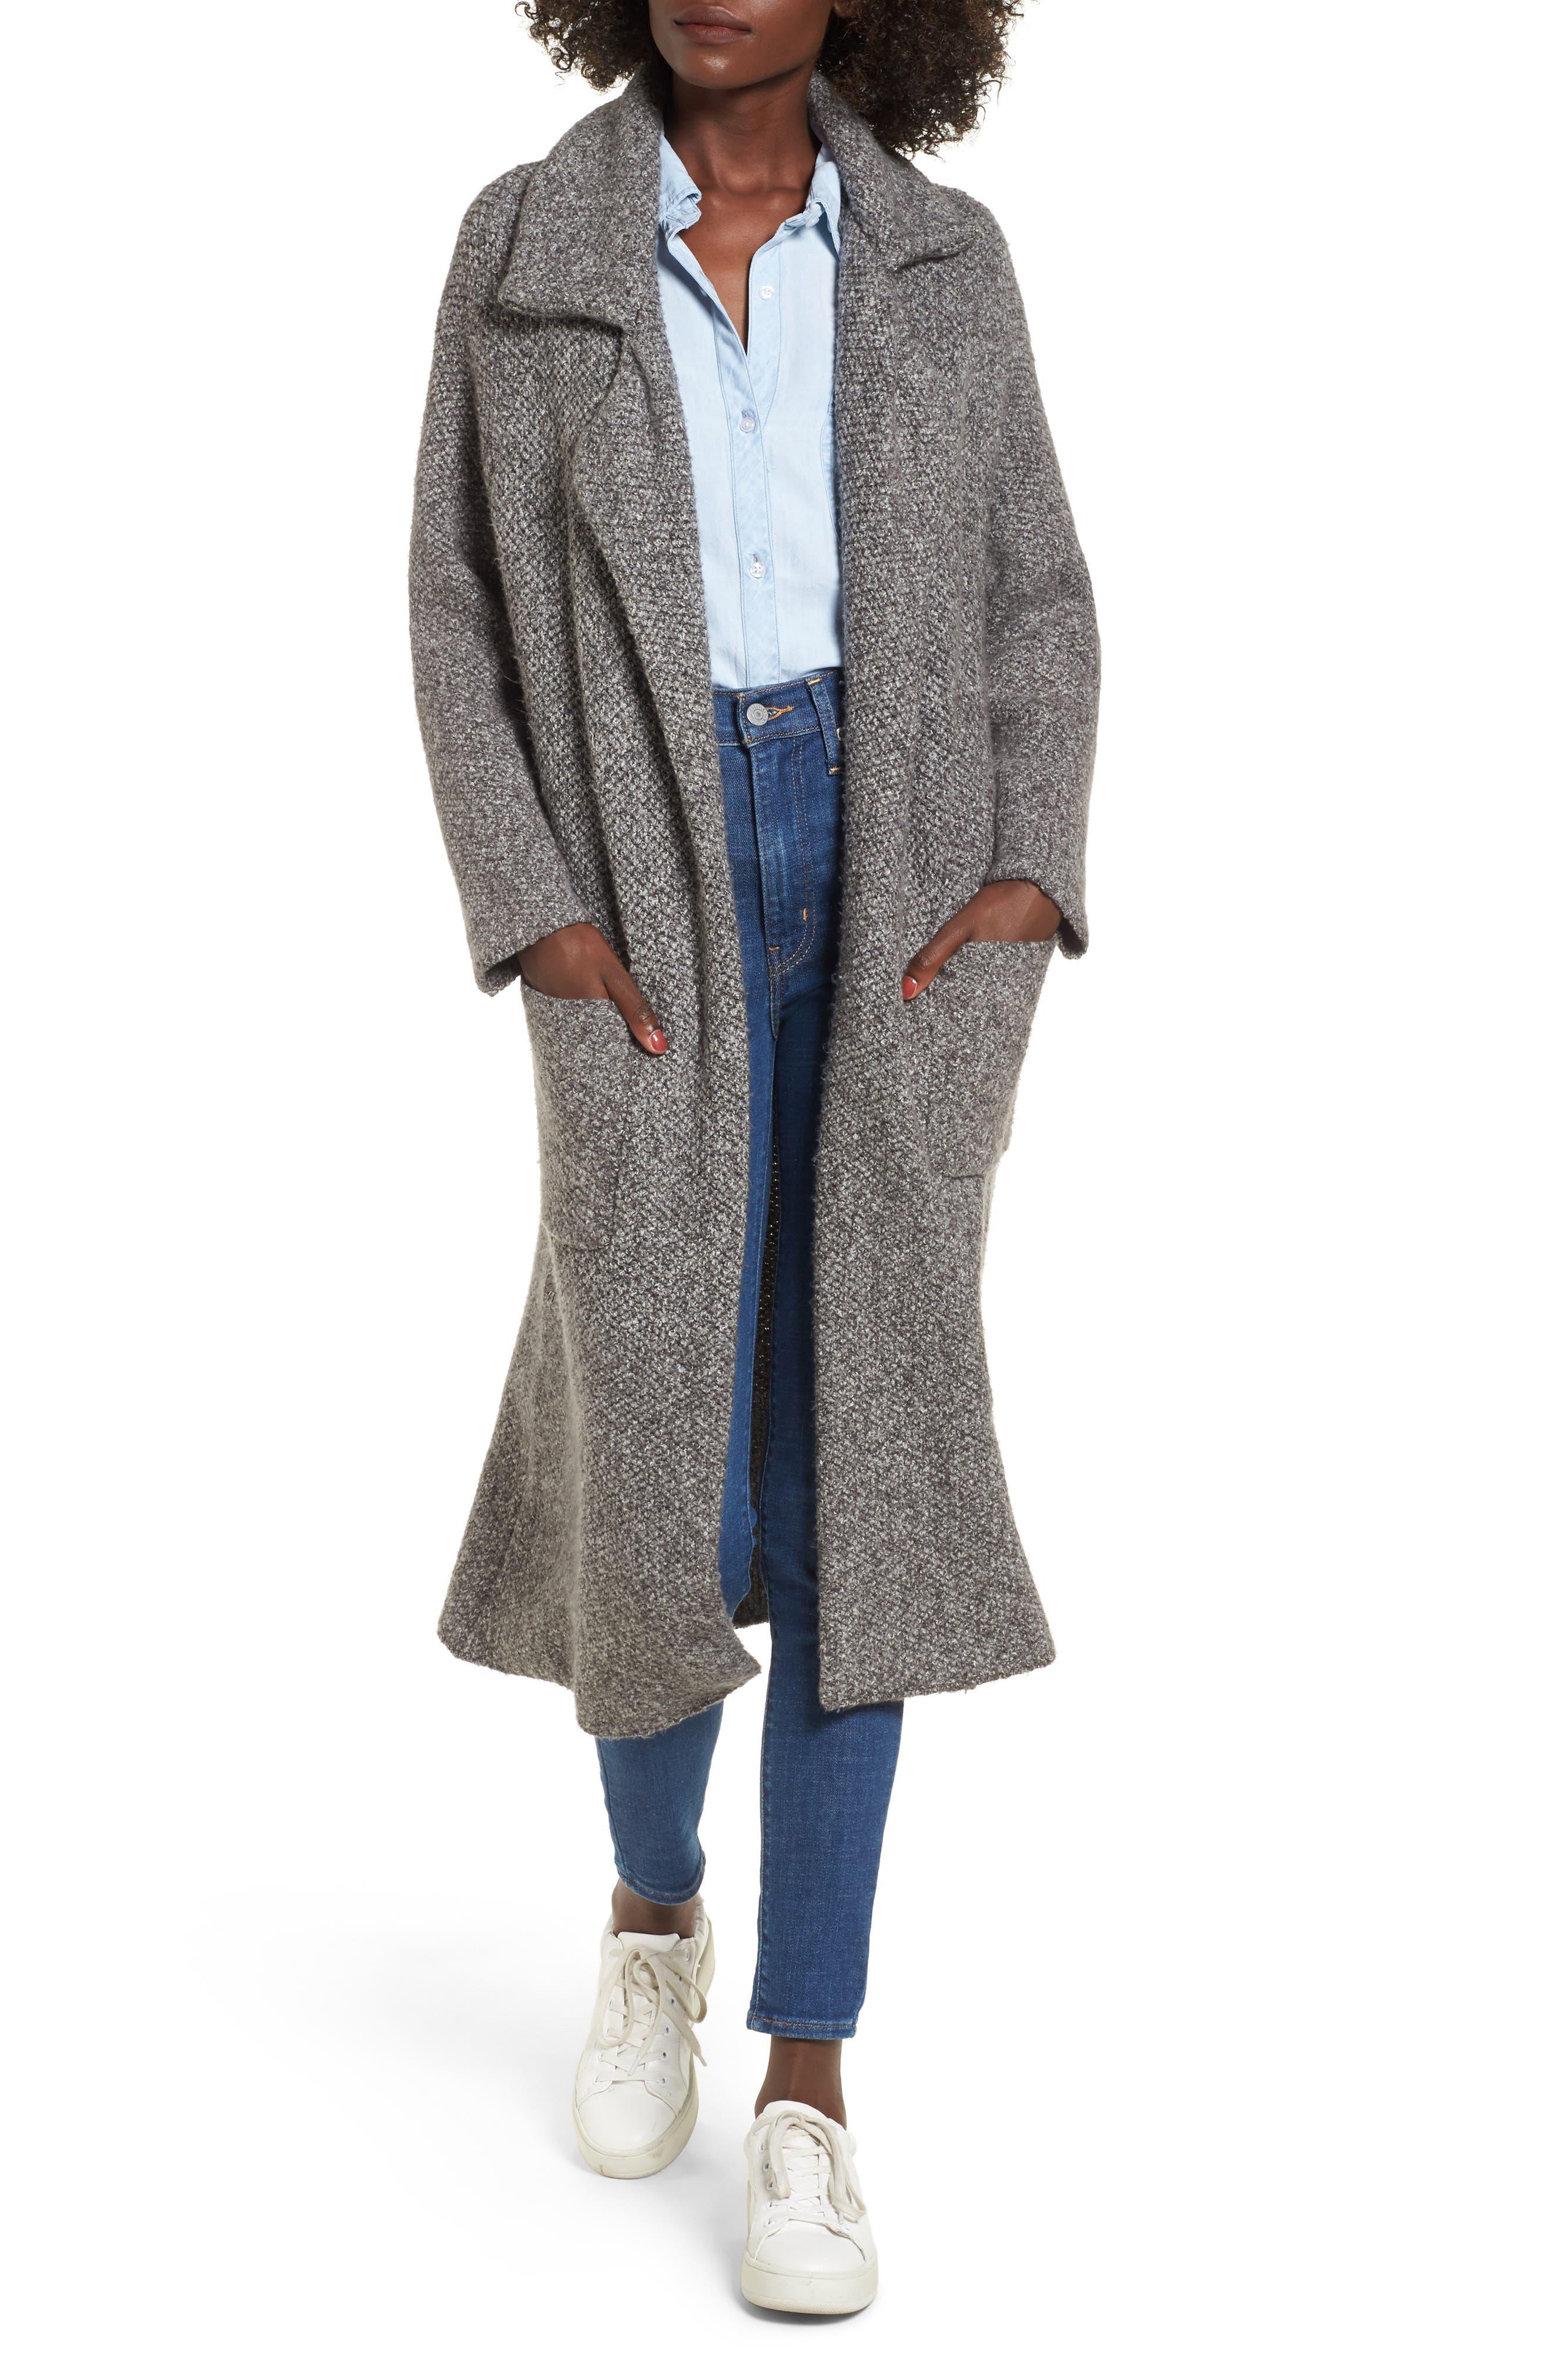 Main Image - Lost + Wander Kala Knit Sweater Jacket